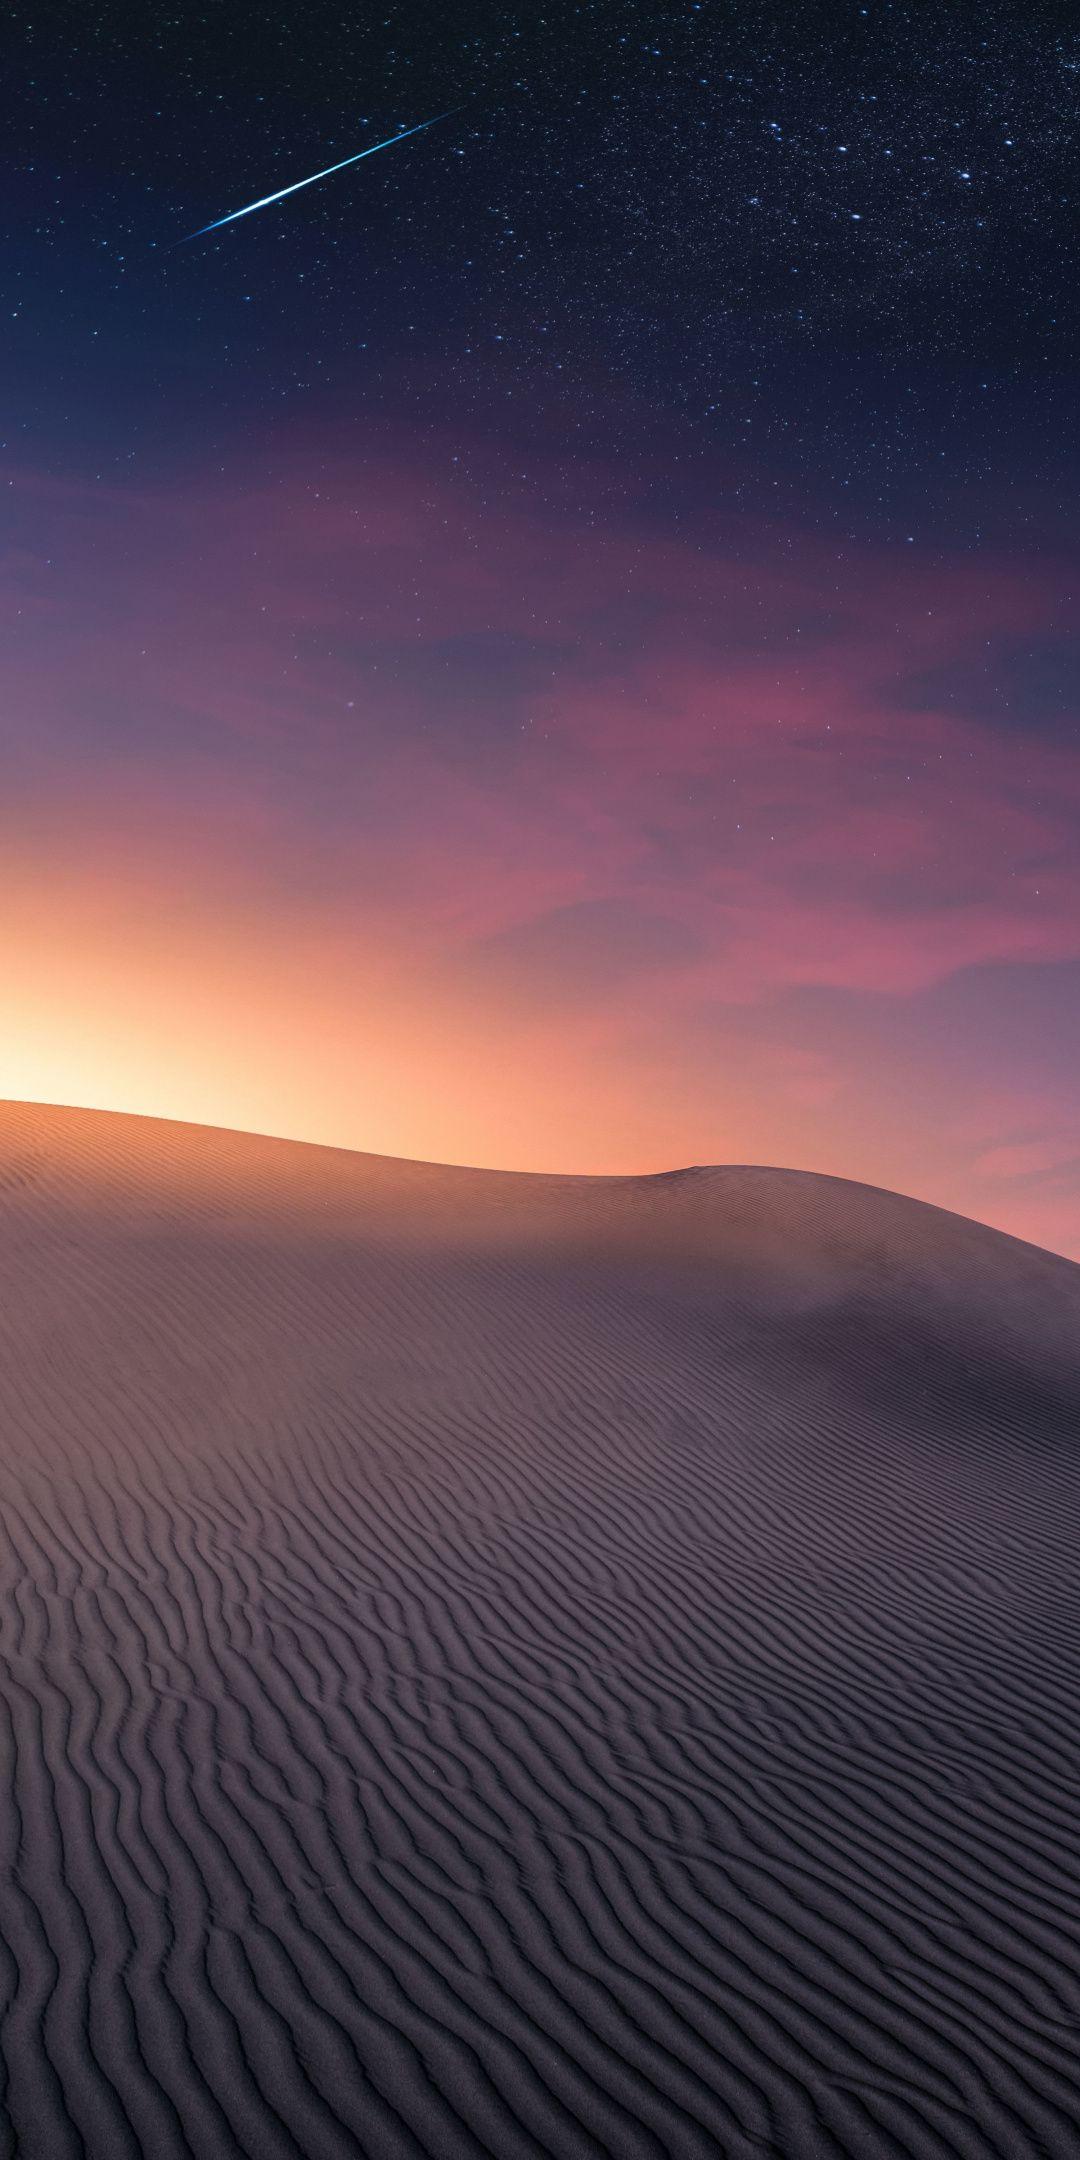 Night, desert, sky, starry sky, 1080x2160 wallpaper